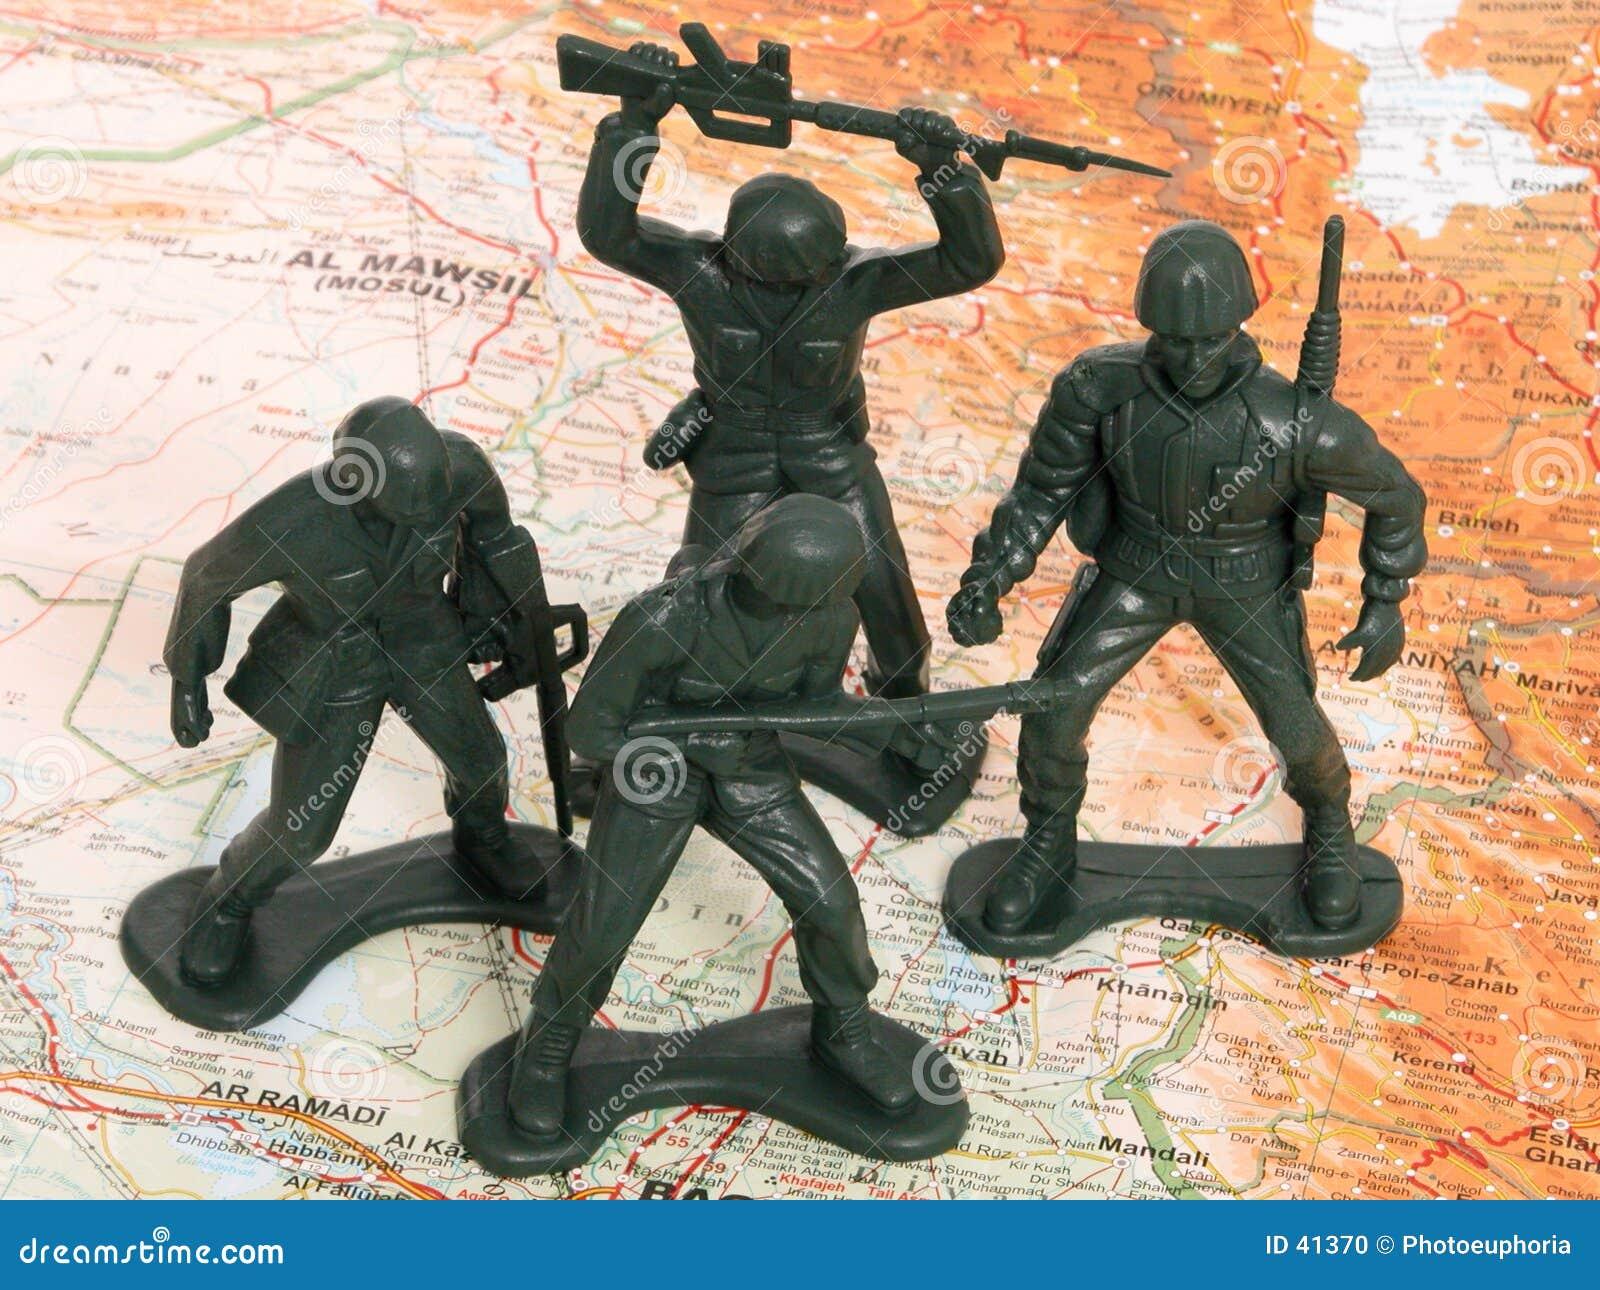 Spielzeug-grüne Armee-Männer im Irak